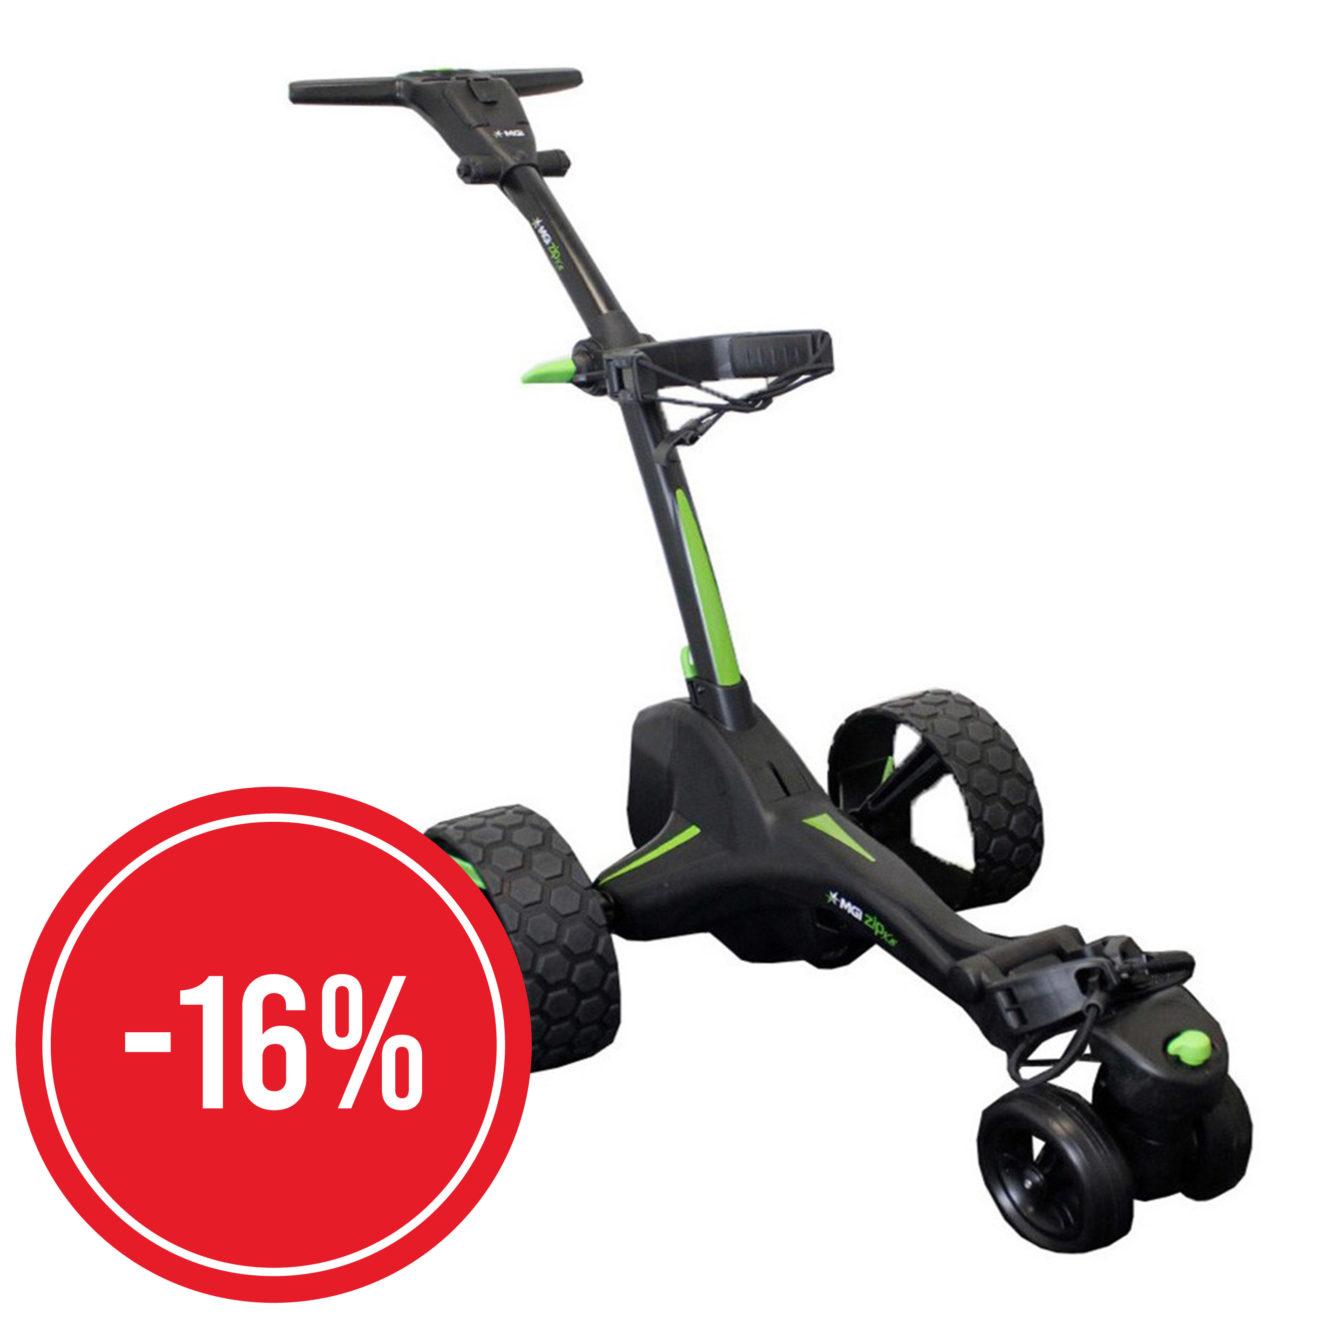 chariot-electrique-mgi-x5-16%.jpeg